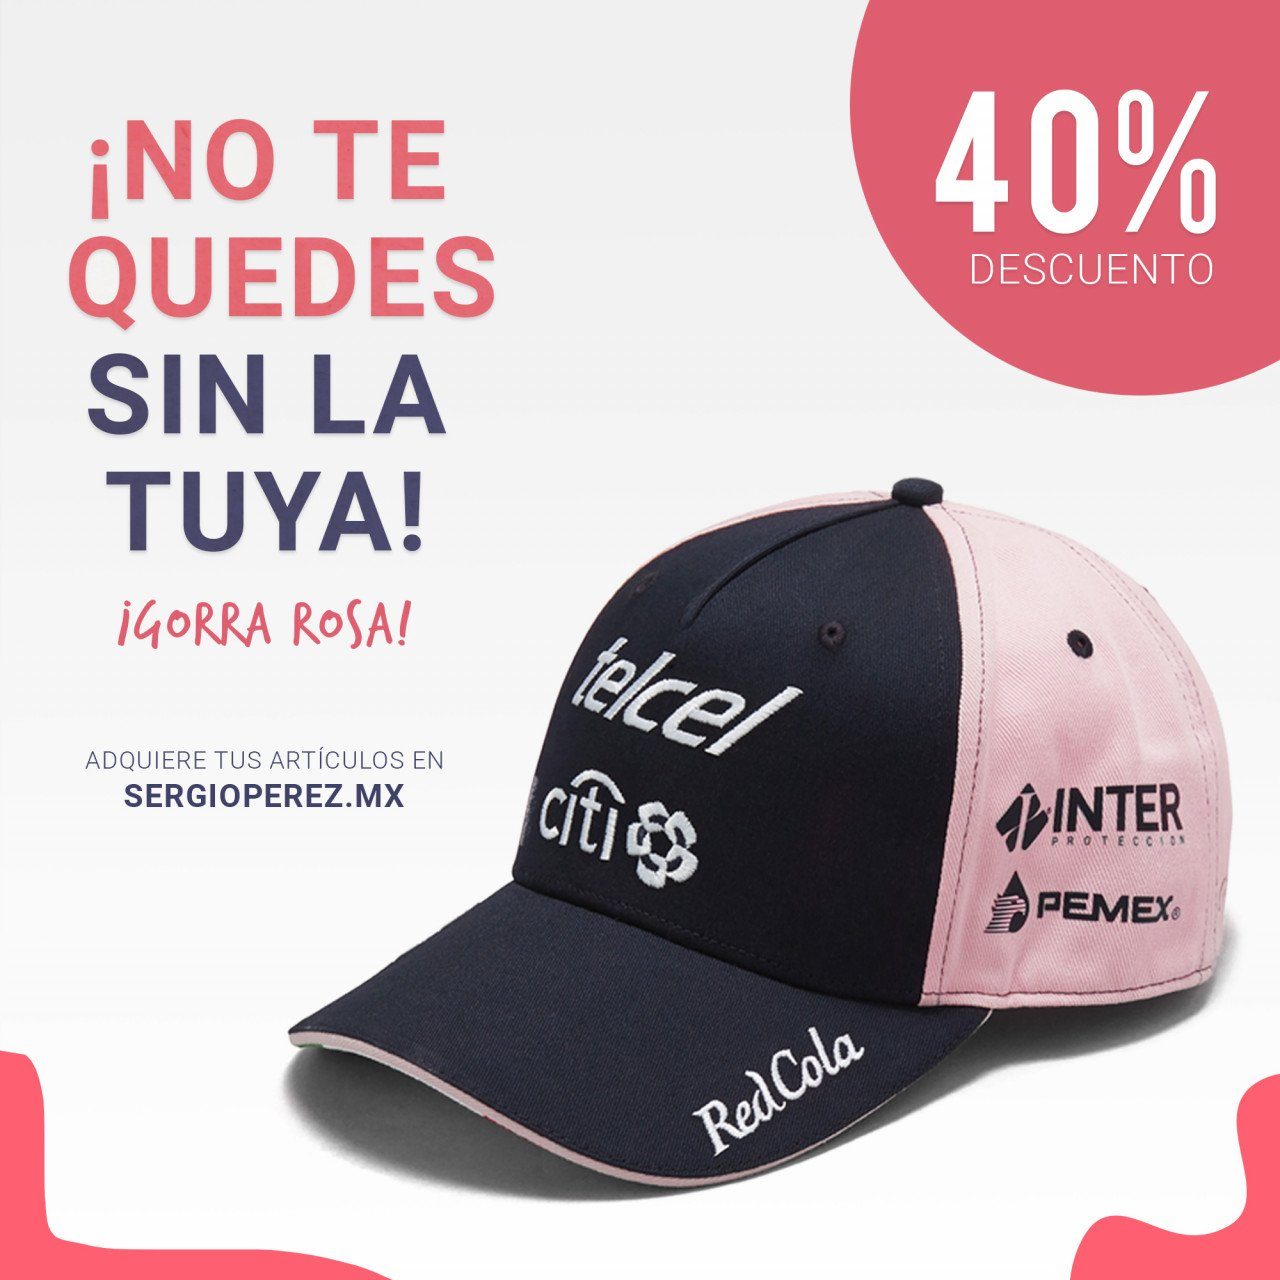 Gorra Checo Pérez Rosa 2018 / 2018 Checo Perez Pink Cap